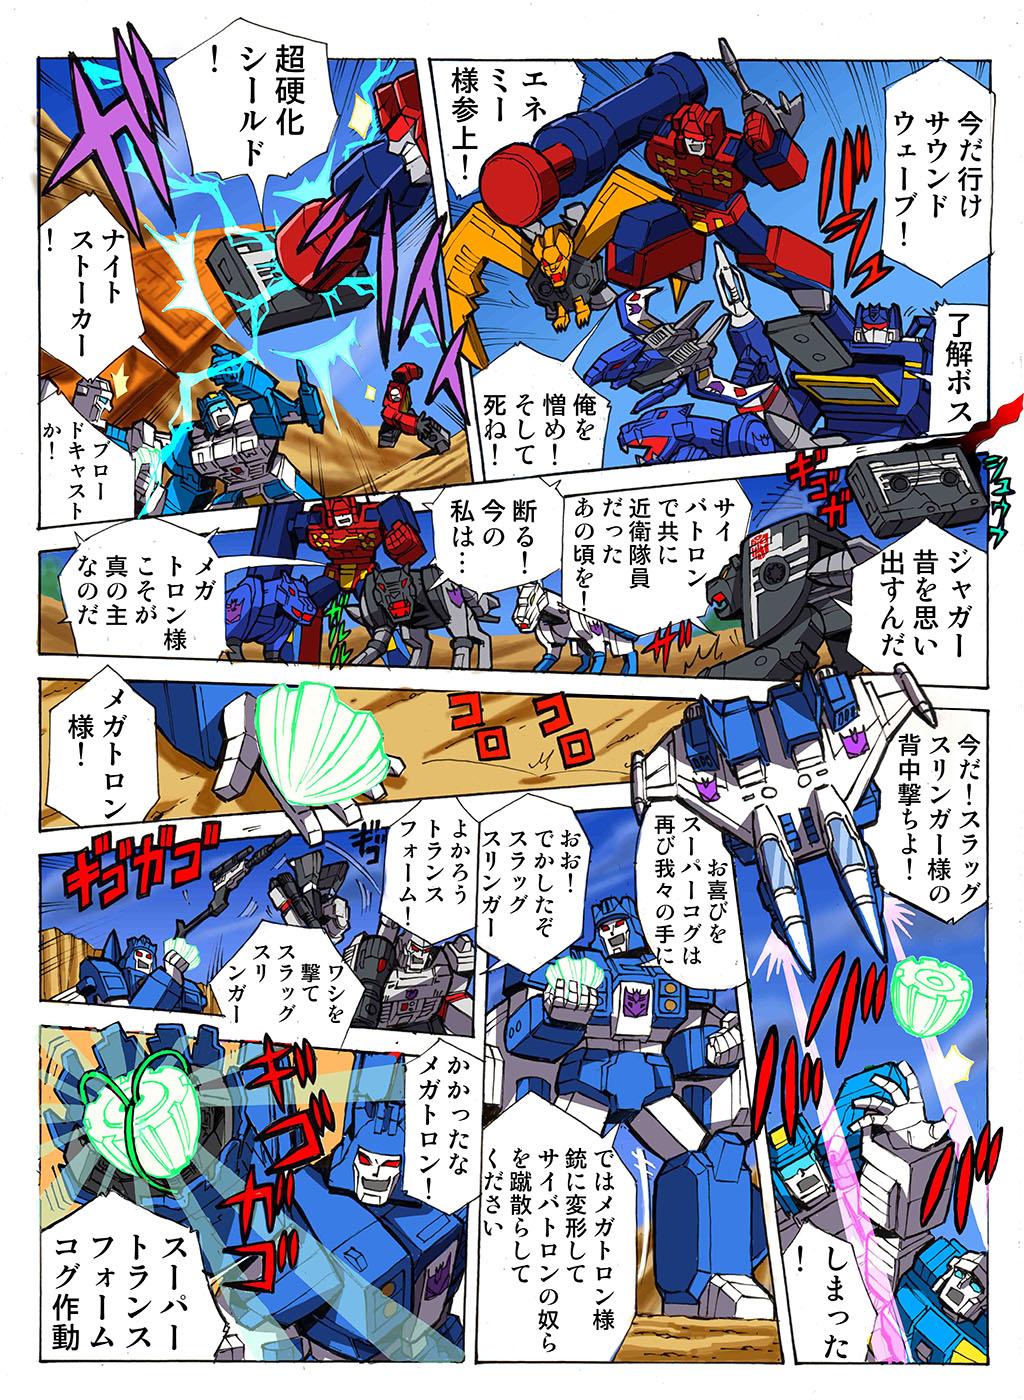 comic web transformers legends takara comics seibertron tfw2005 legedns ep boards energon pub forums